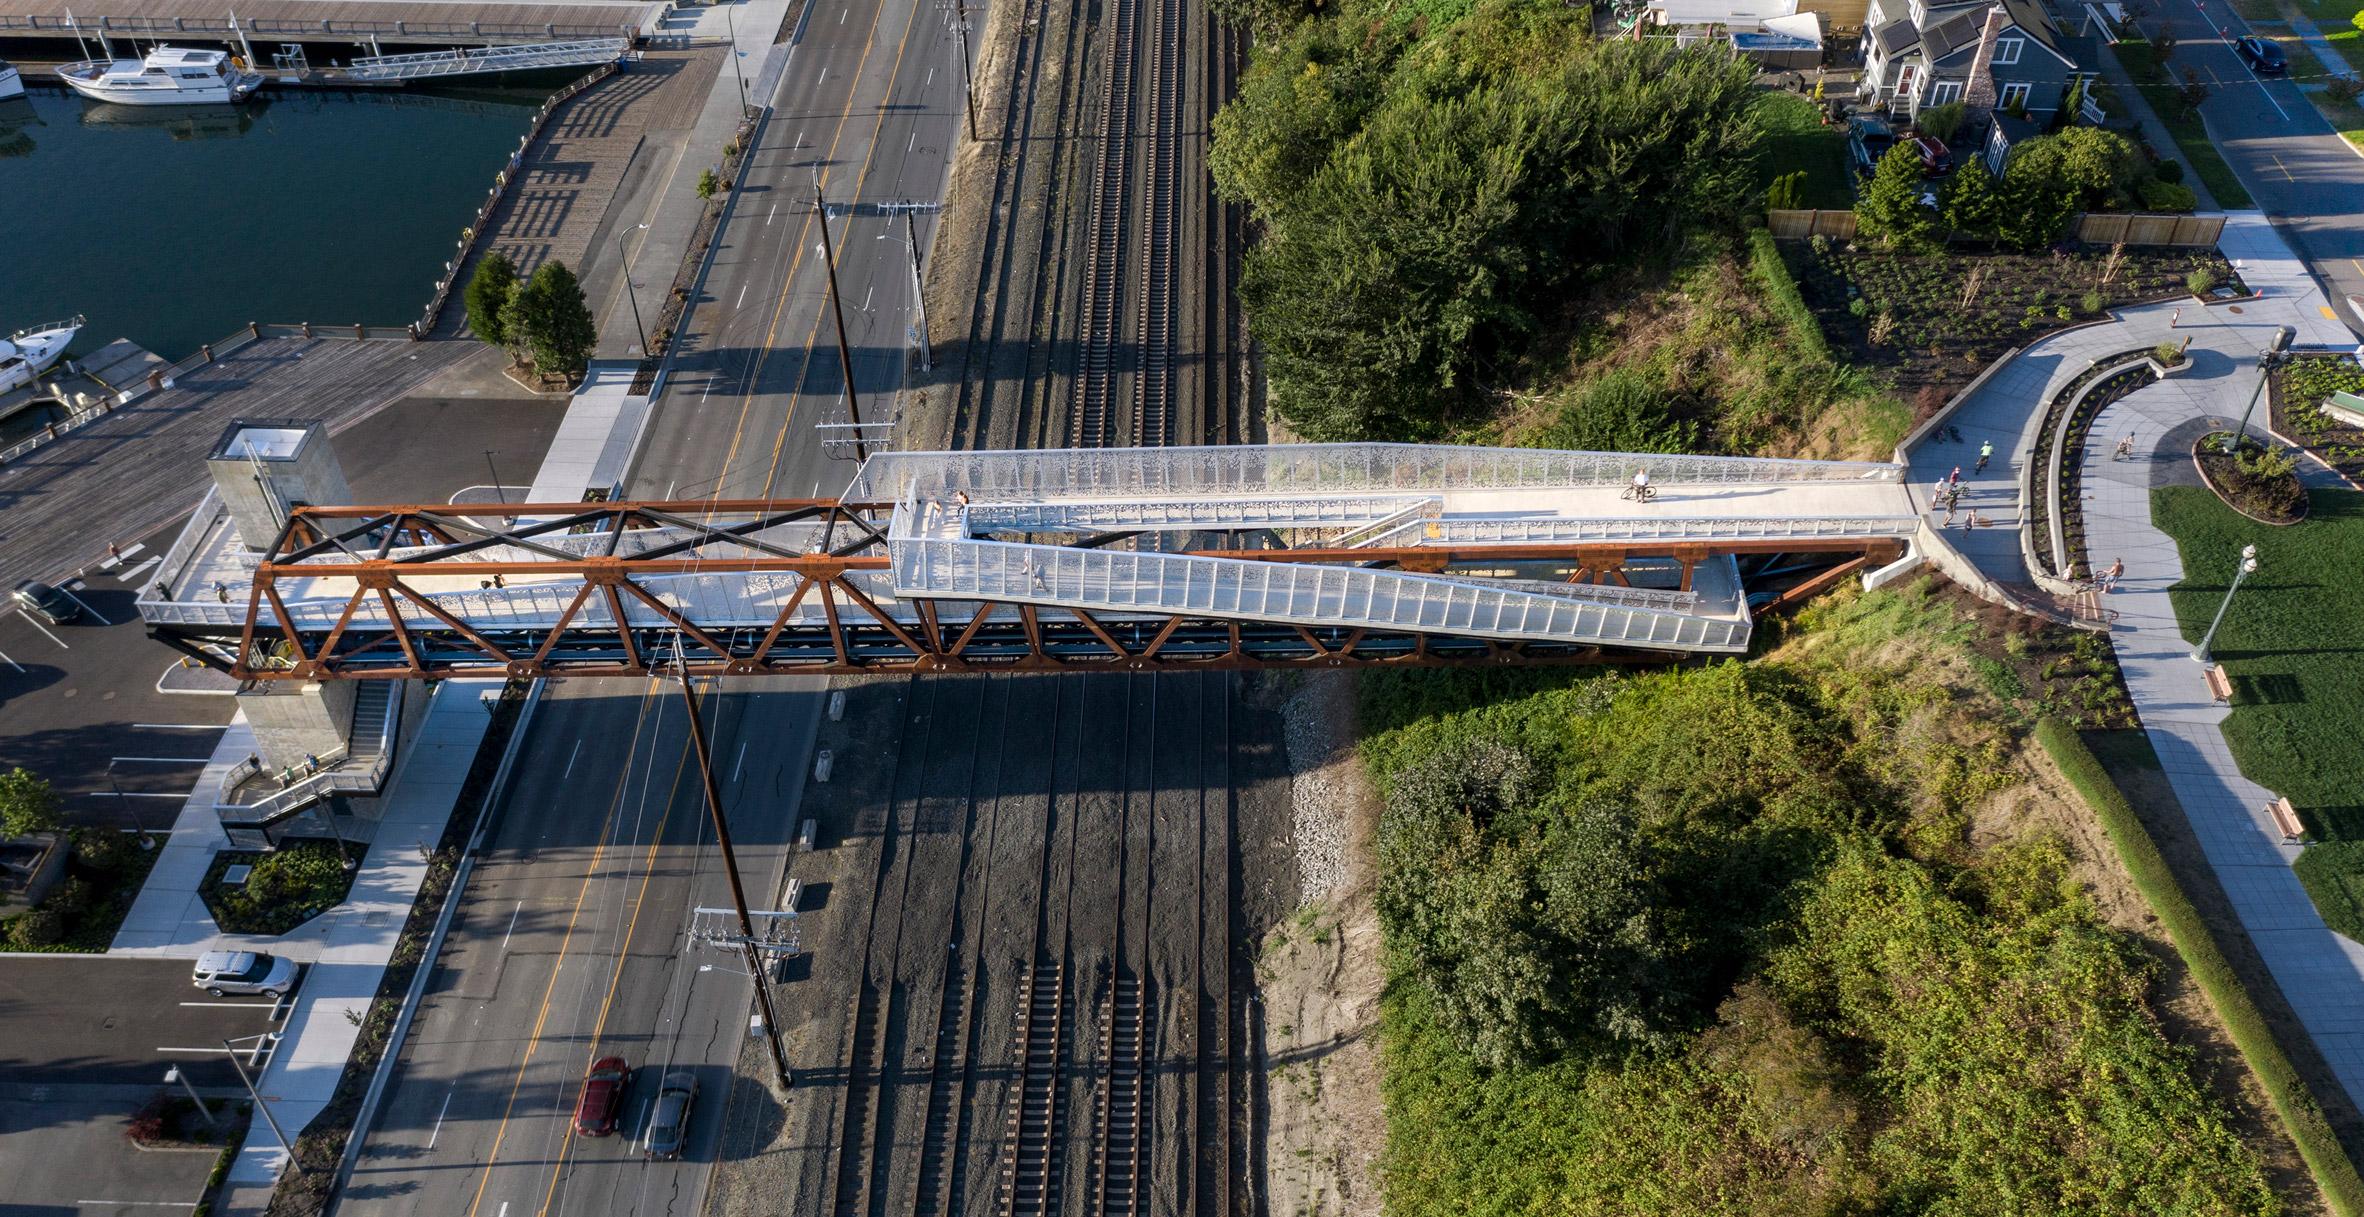 New Grand Avenue Park Bridge by LMN Architects